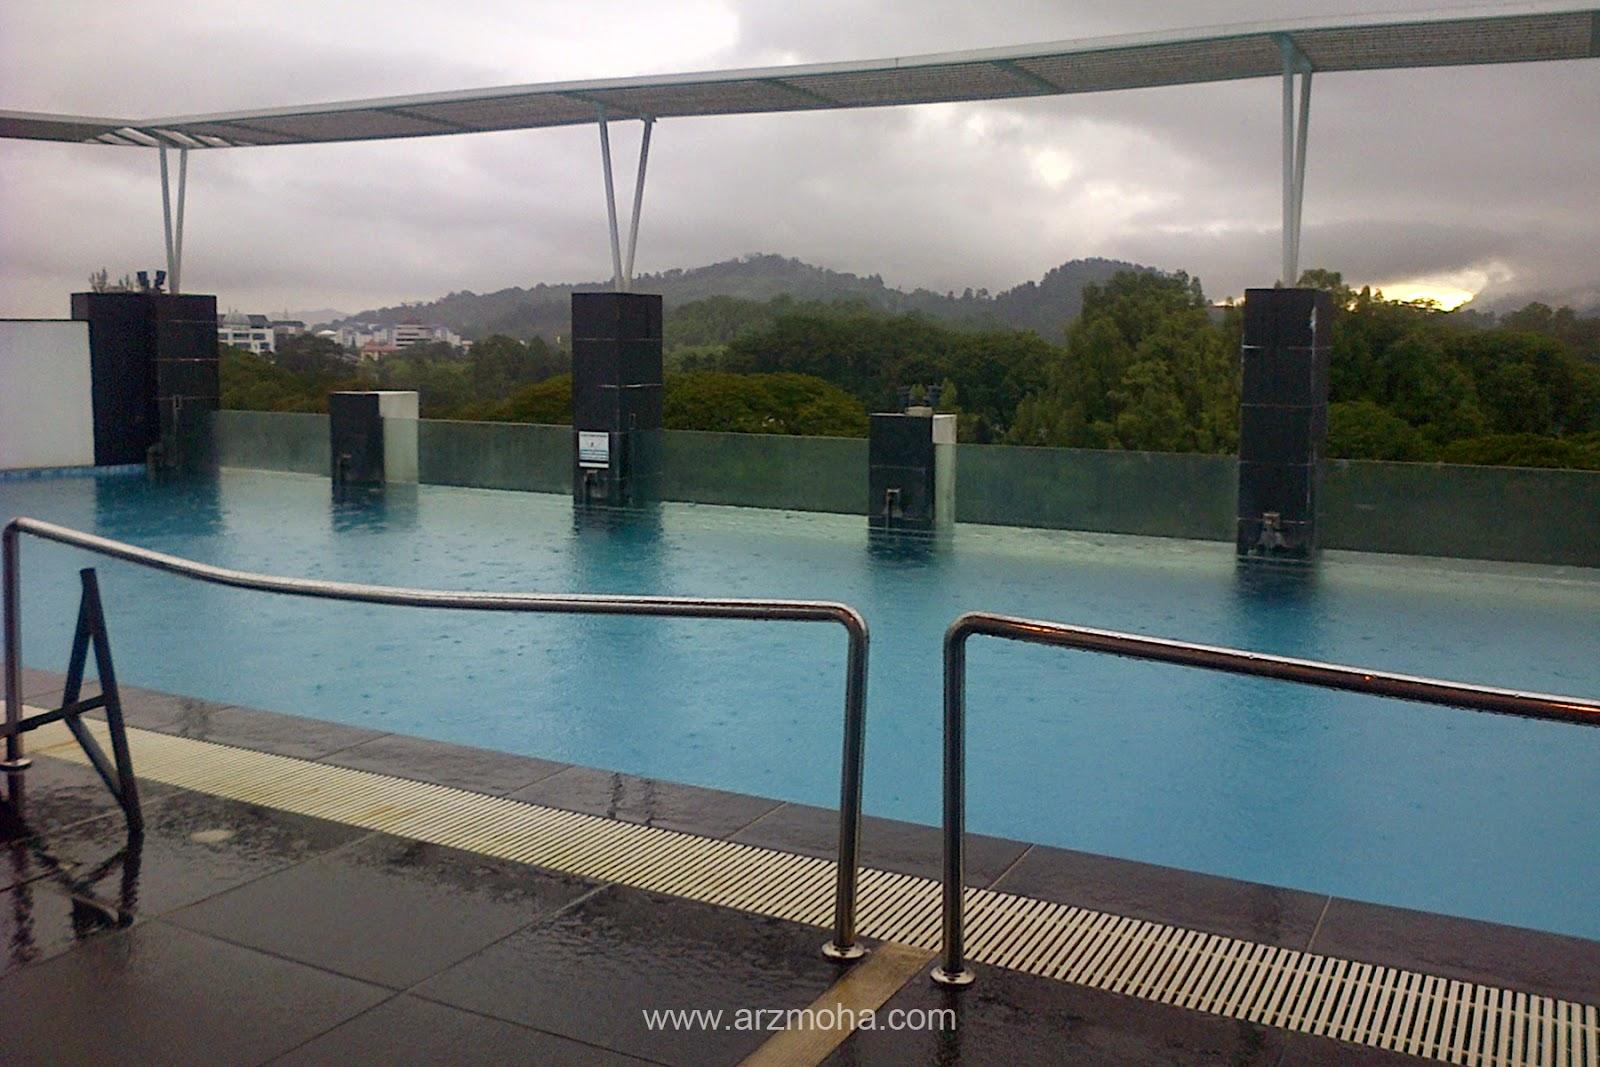 Visit taiping, Flemington Hotel, Visit Malaysia, gambar cantik, Swimming pool, raining